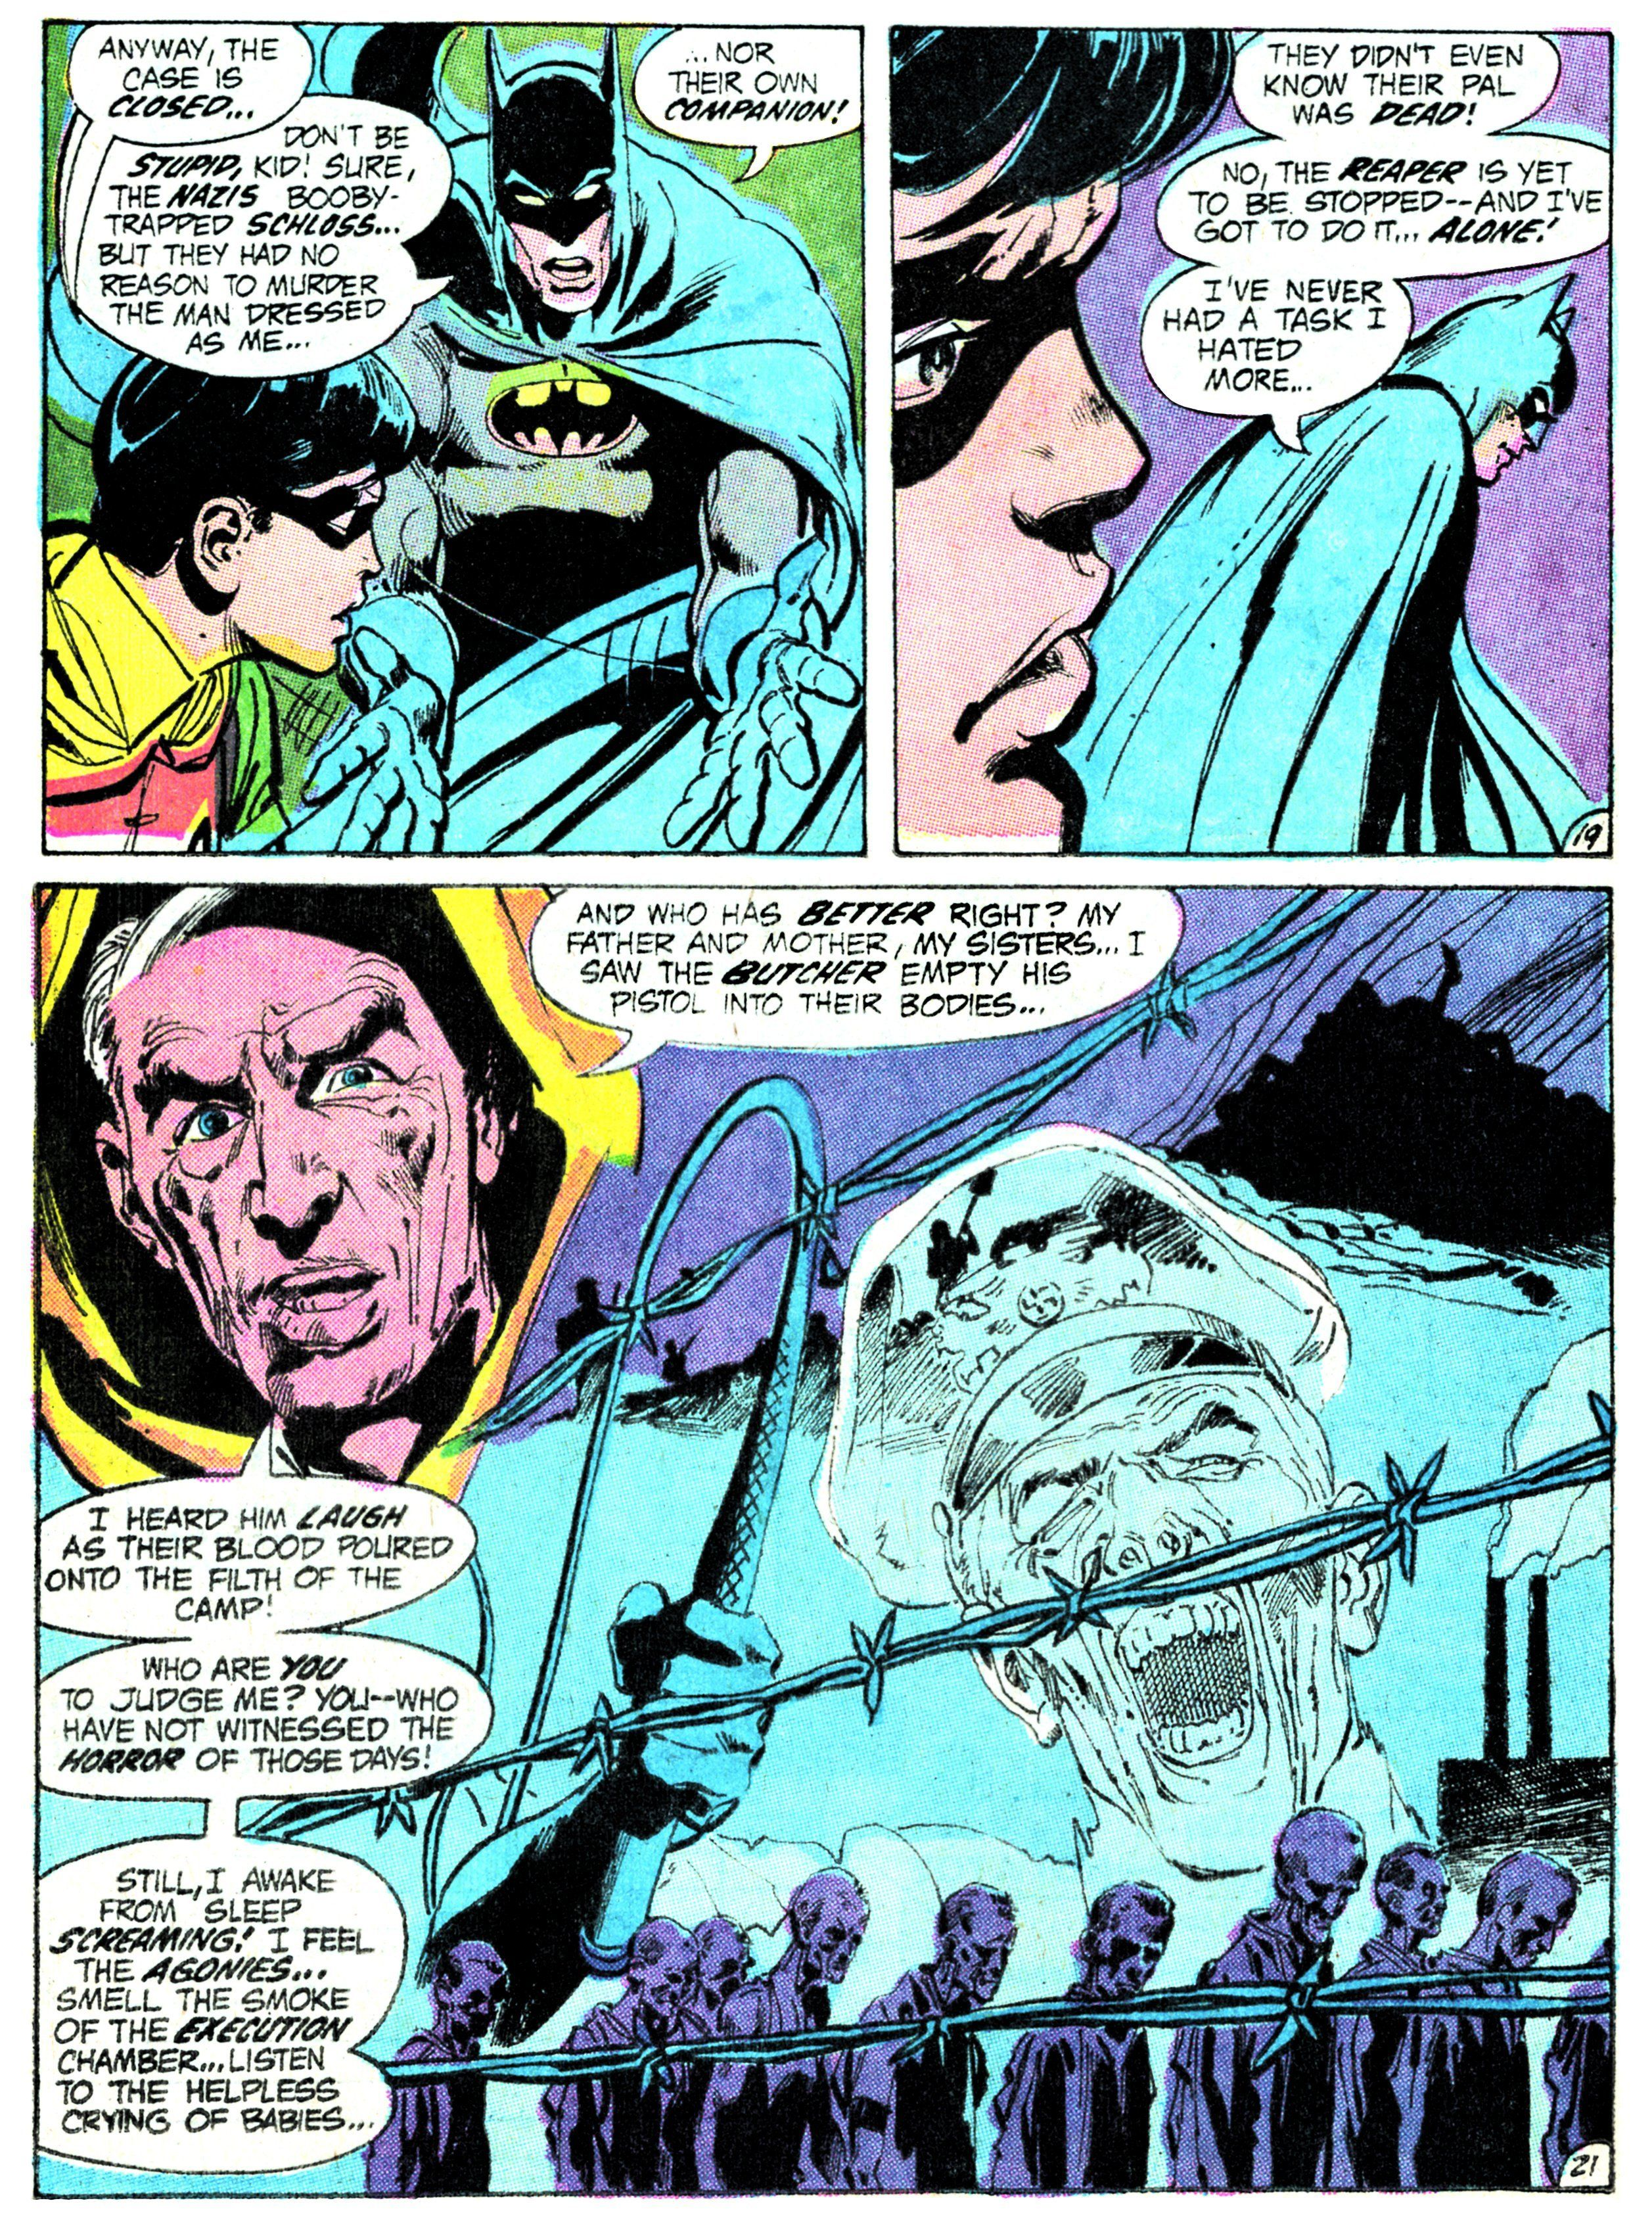 "Batman #237 ""Night of The Reaper,"" from Decembe 1971"